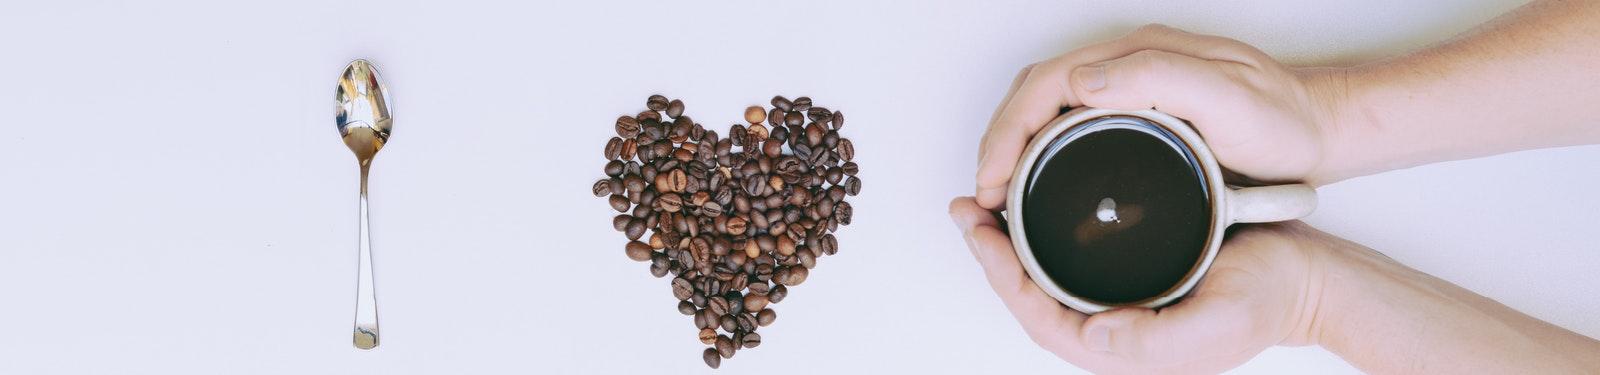 beber cafe ayuda a quemar grasa